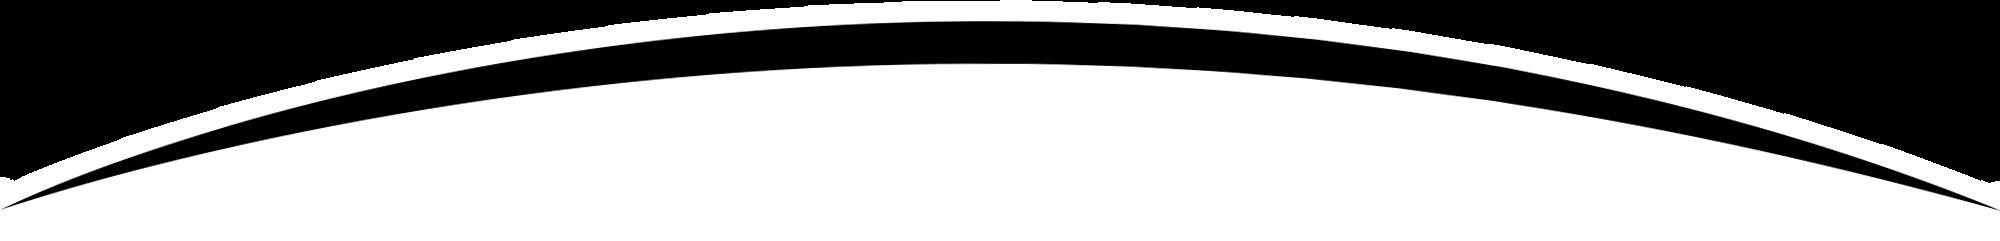 banner-curve